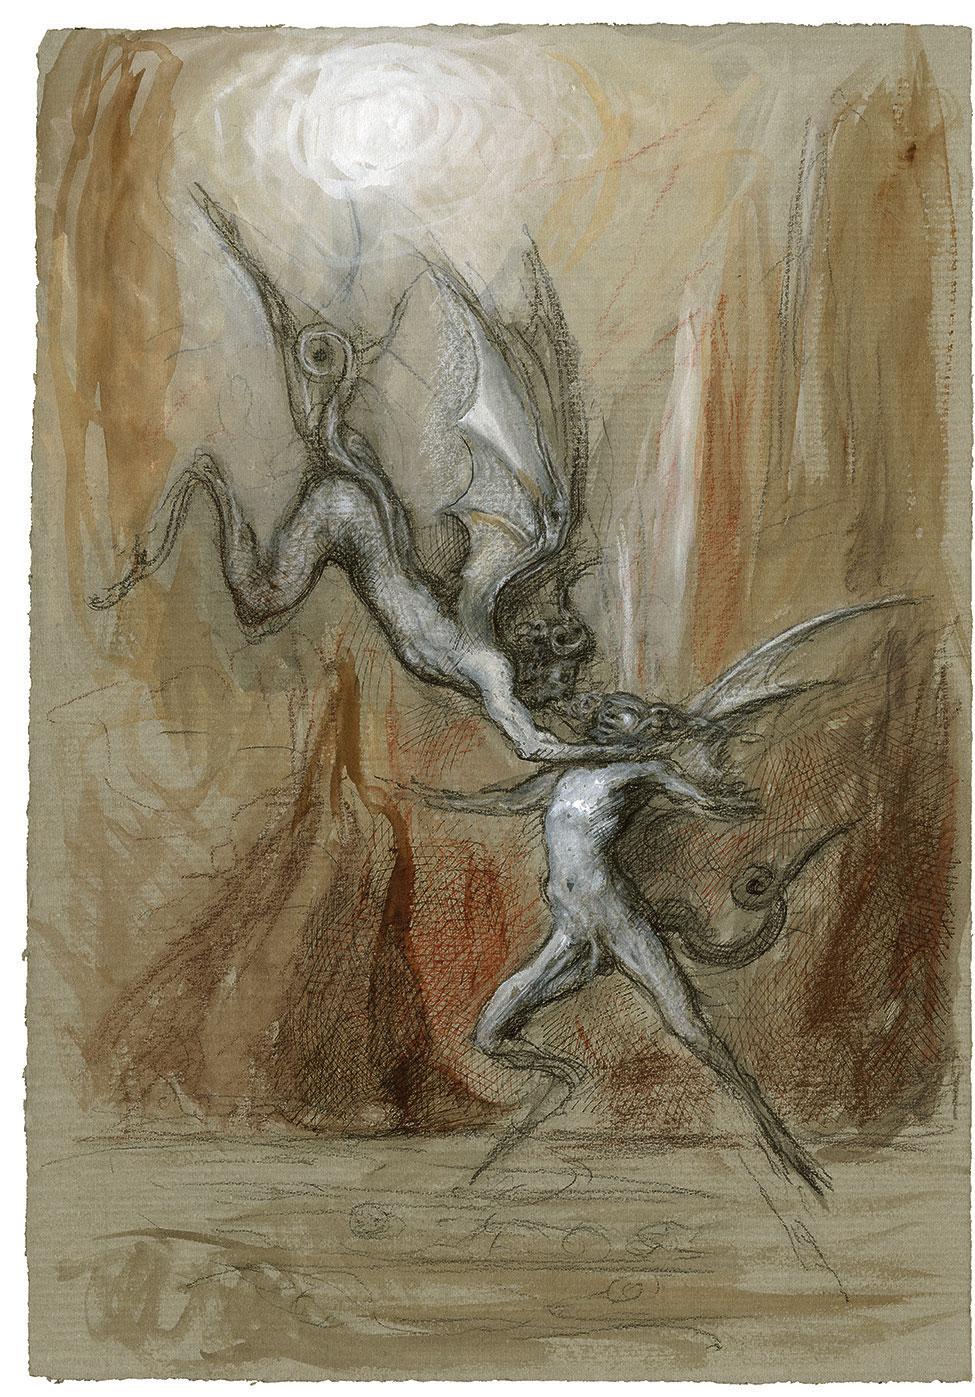 Zuffa-dei-demoni